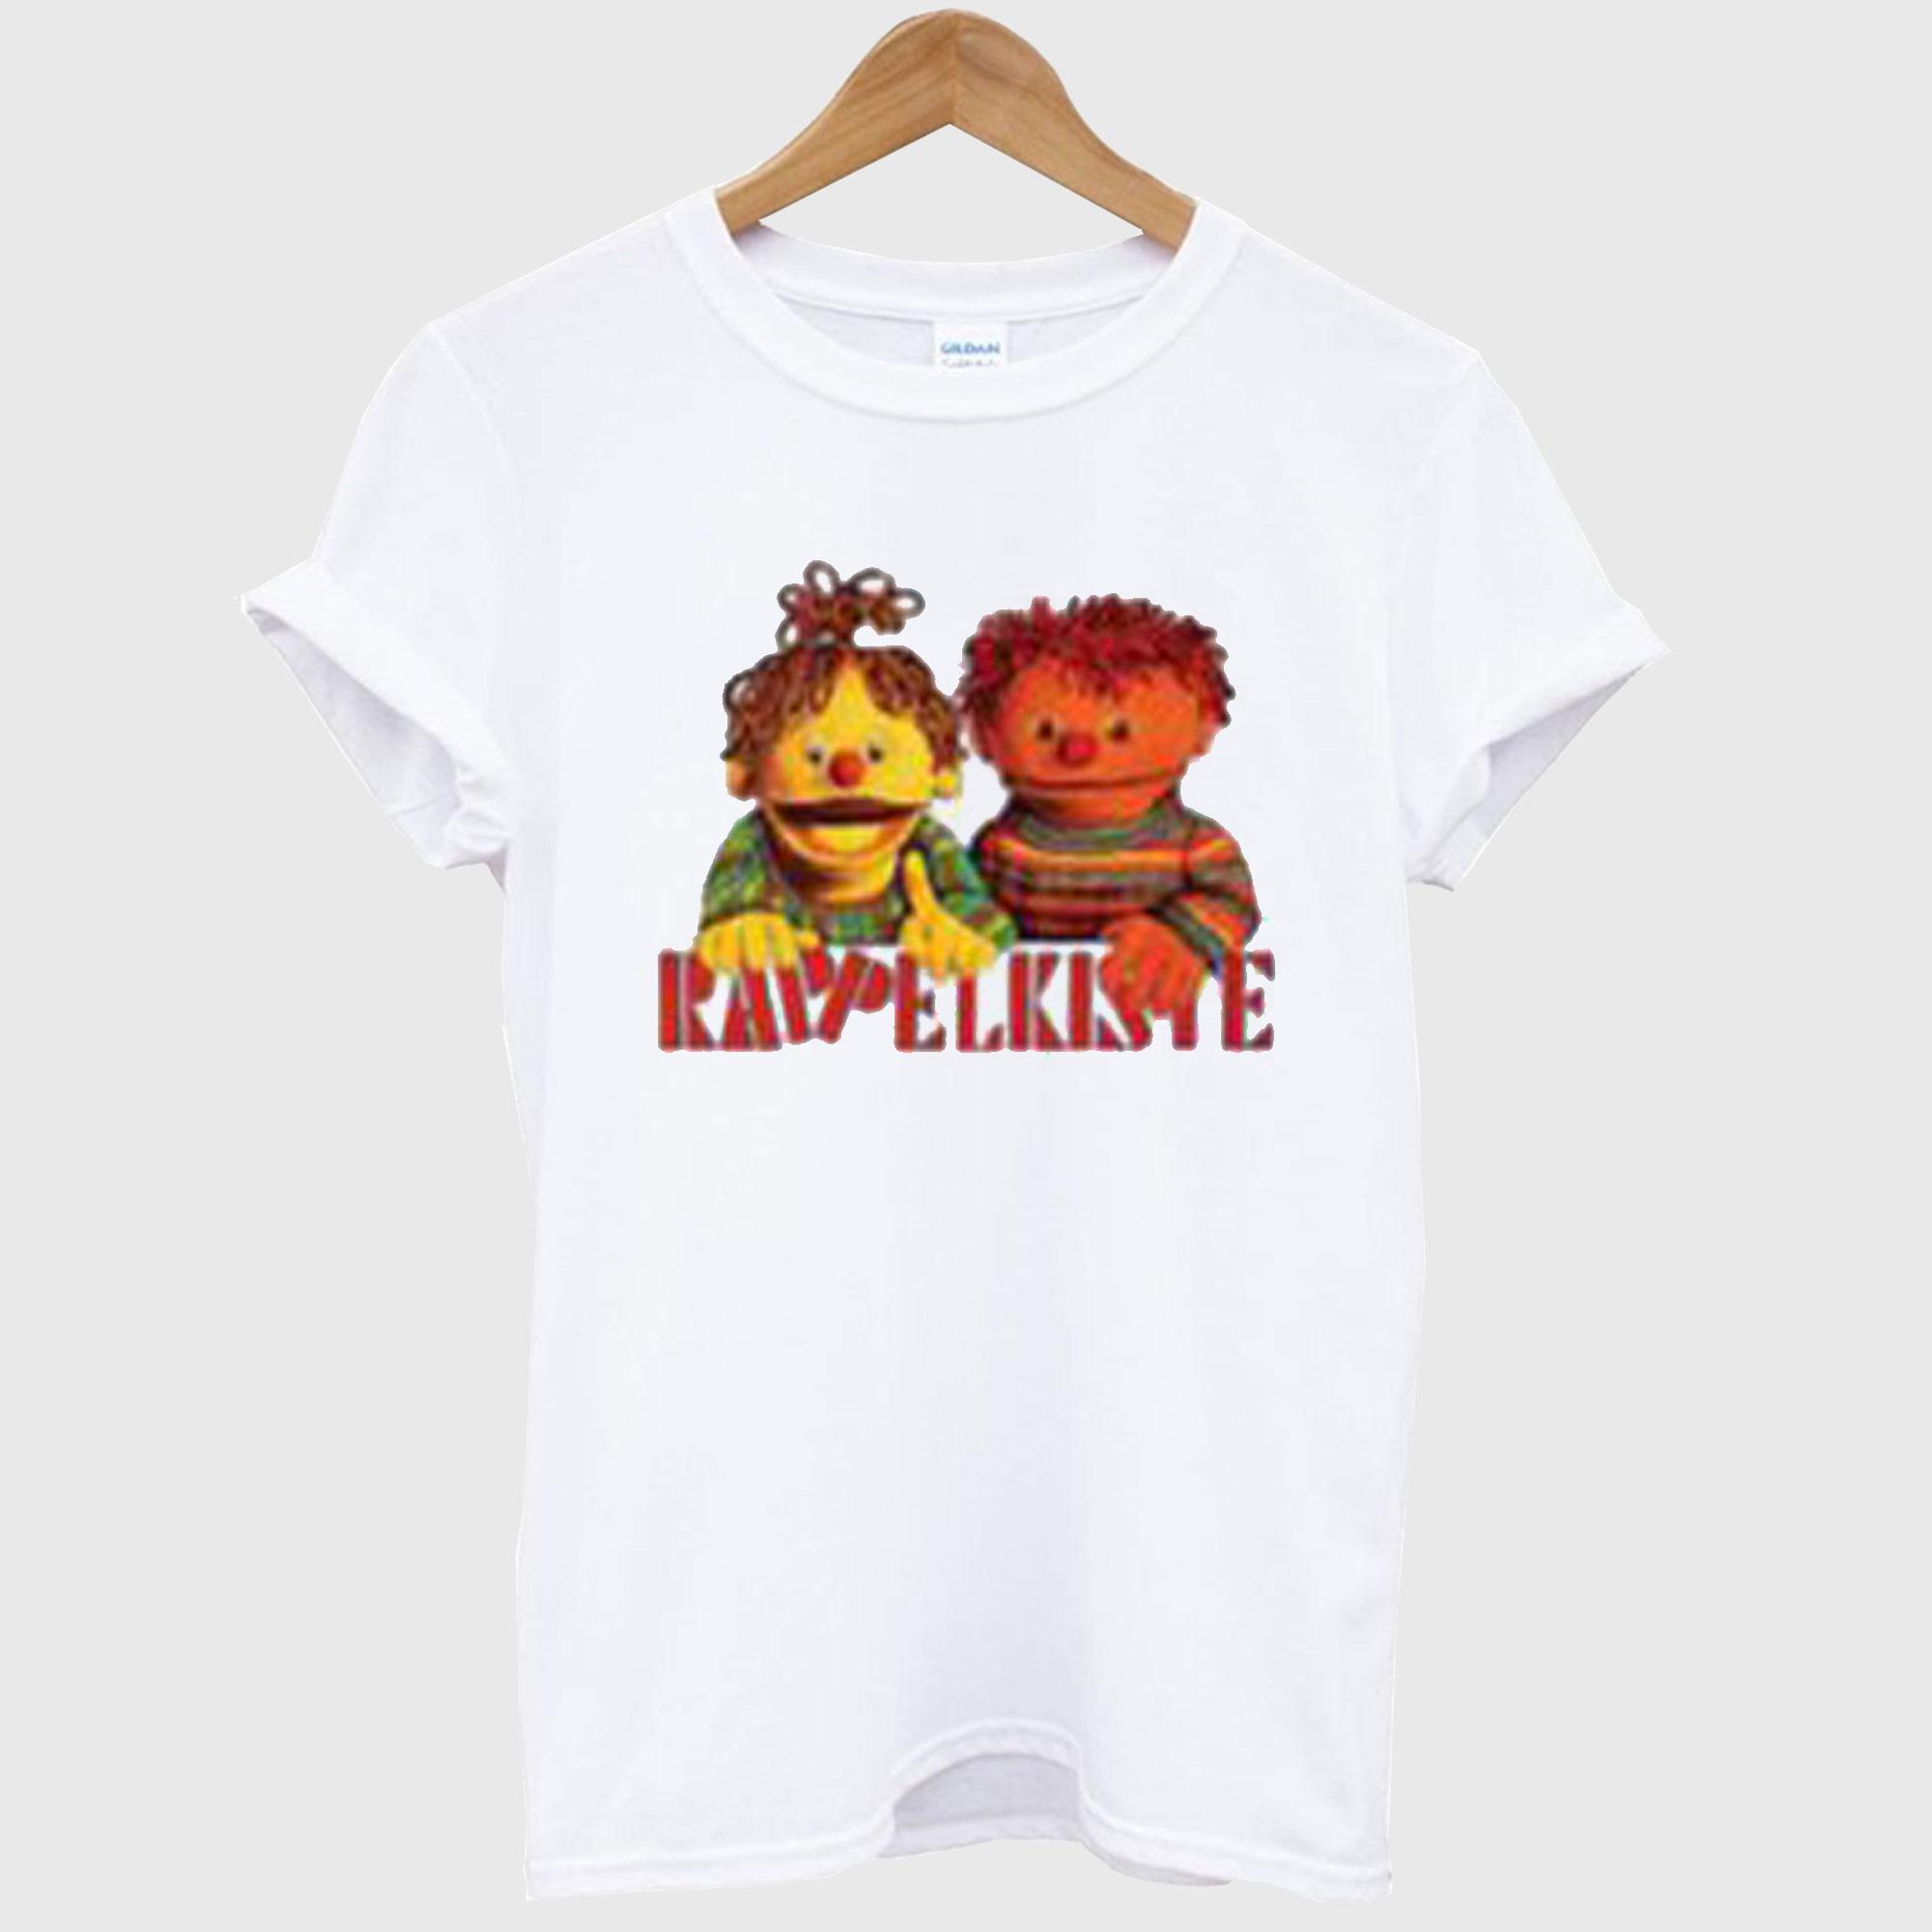 Rappelkiste T shirt